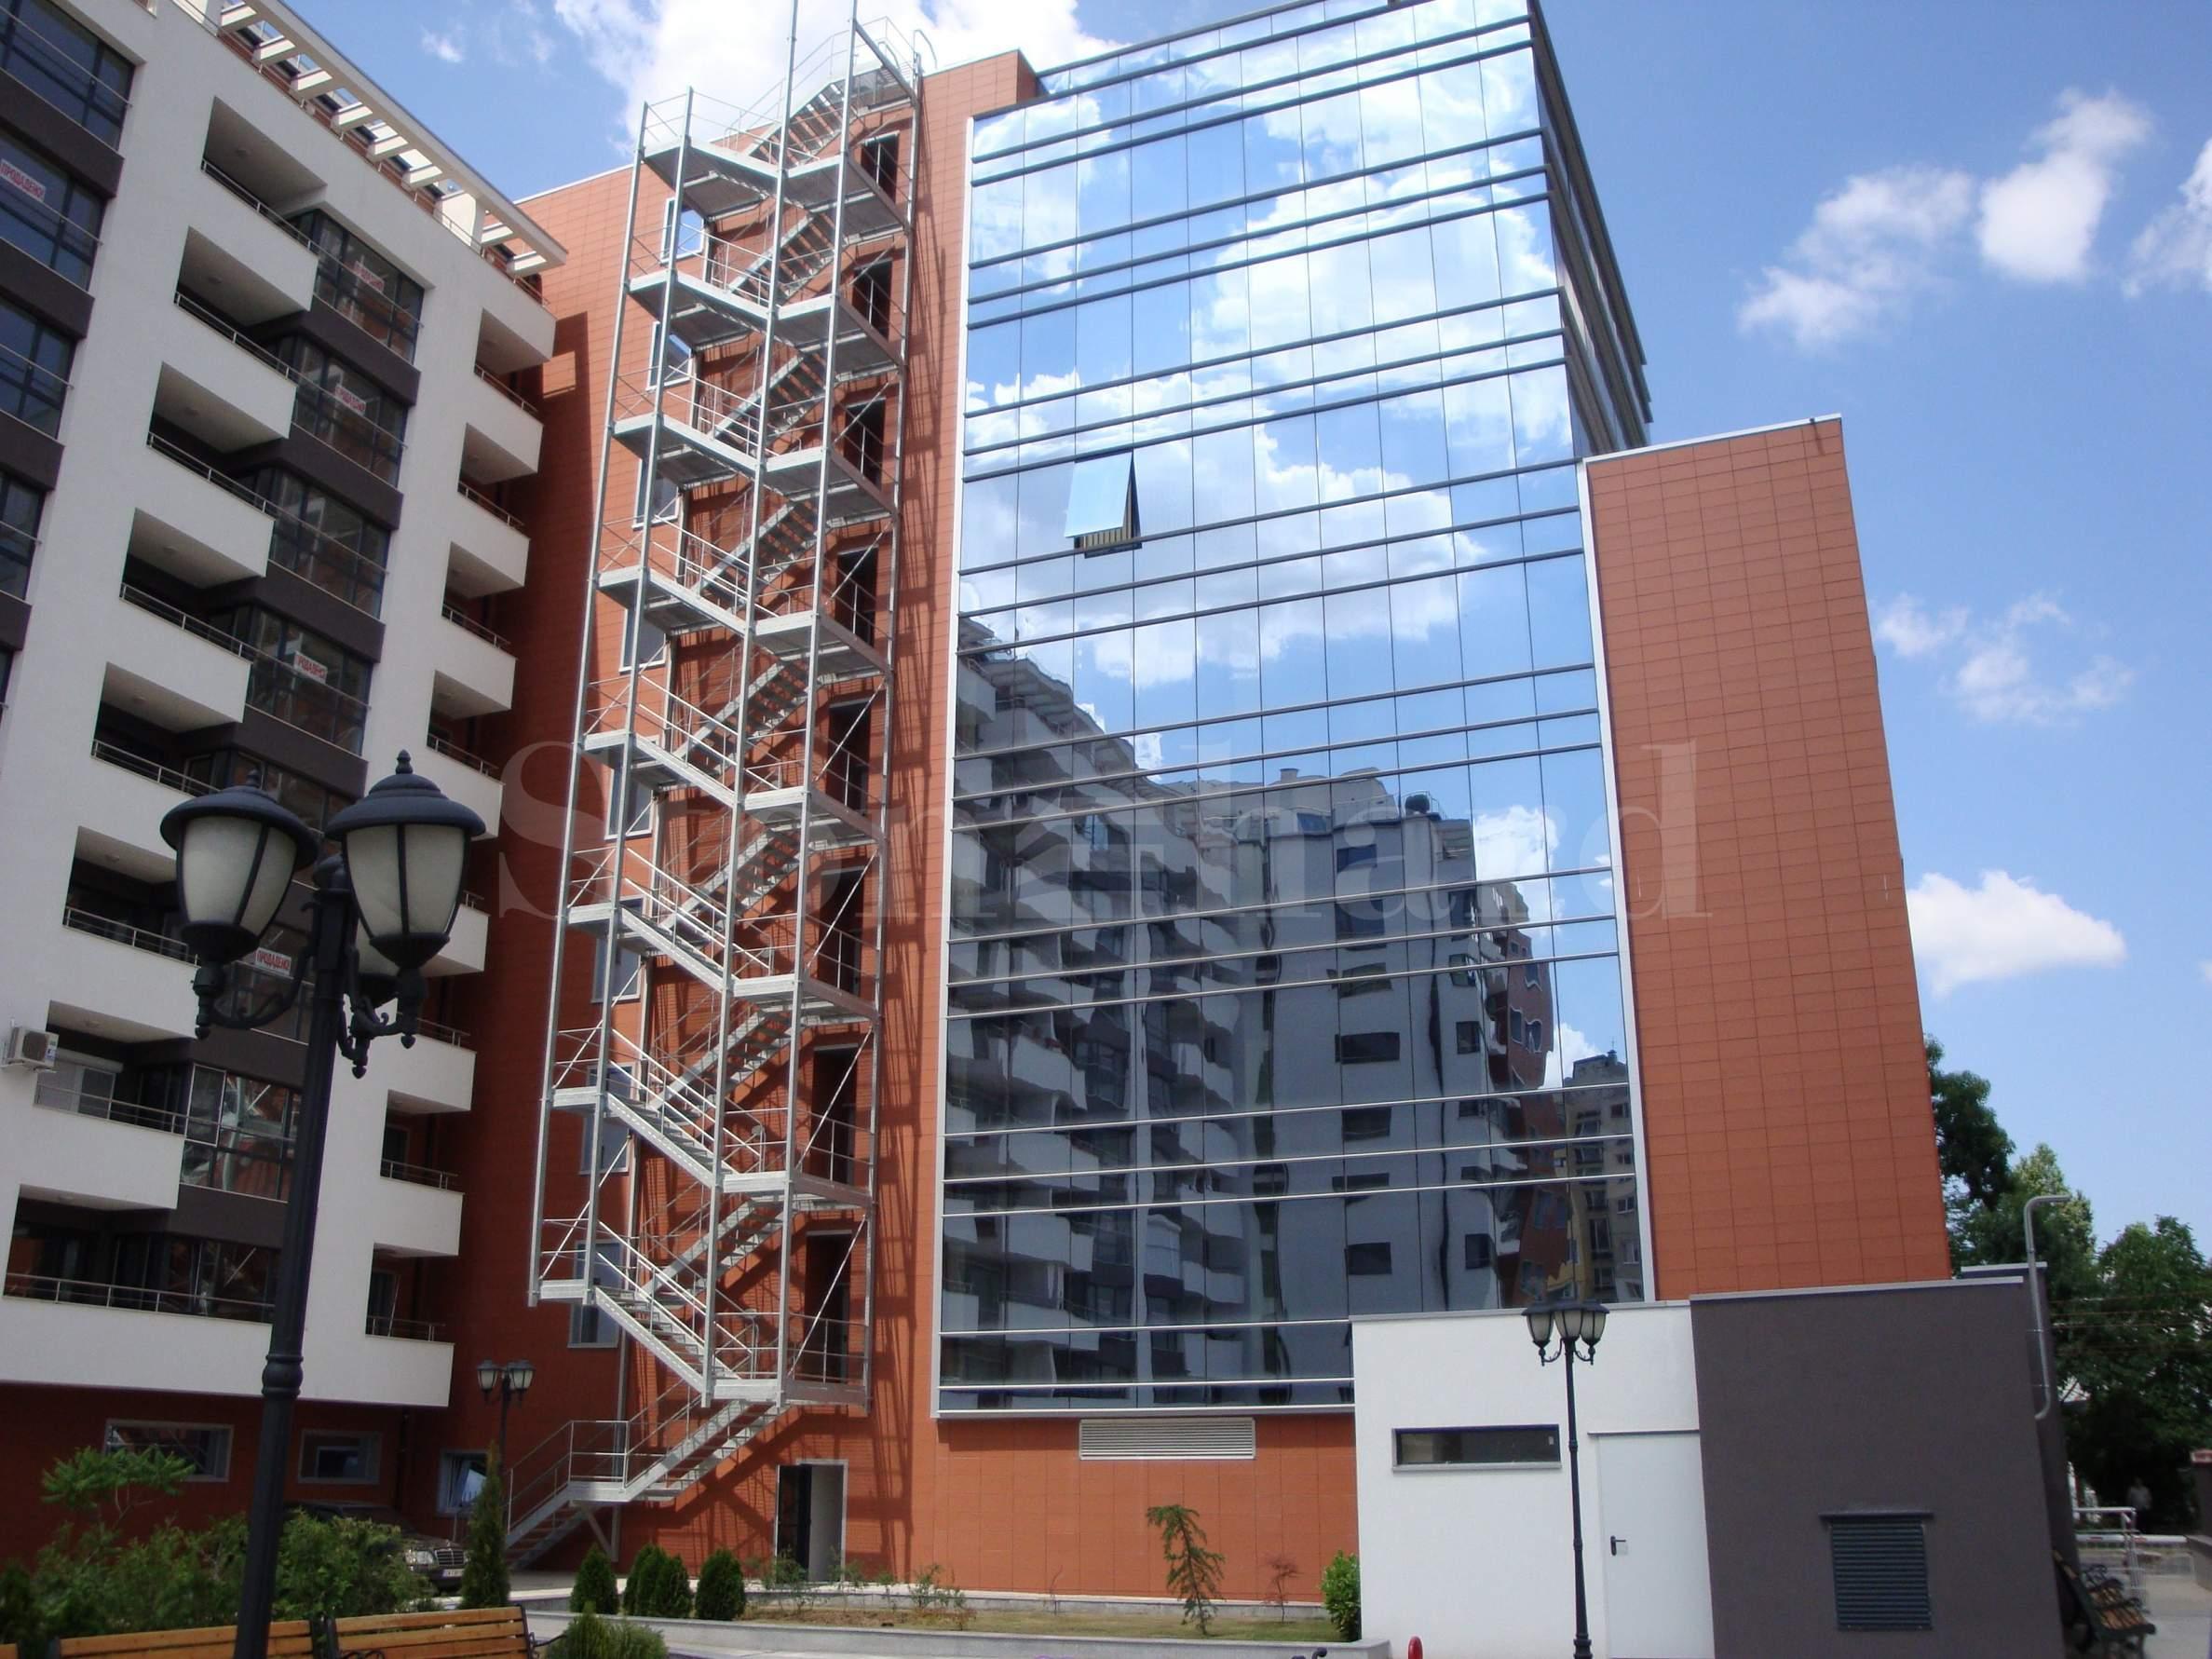 Luxury office building near metro station Konstantin Velichkov1 - Stonehard